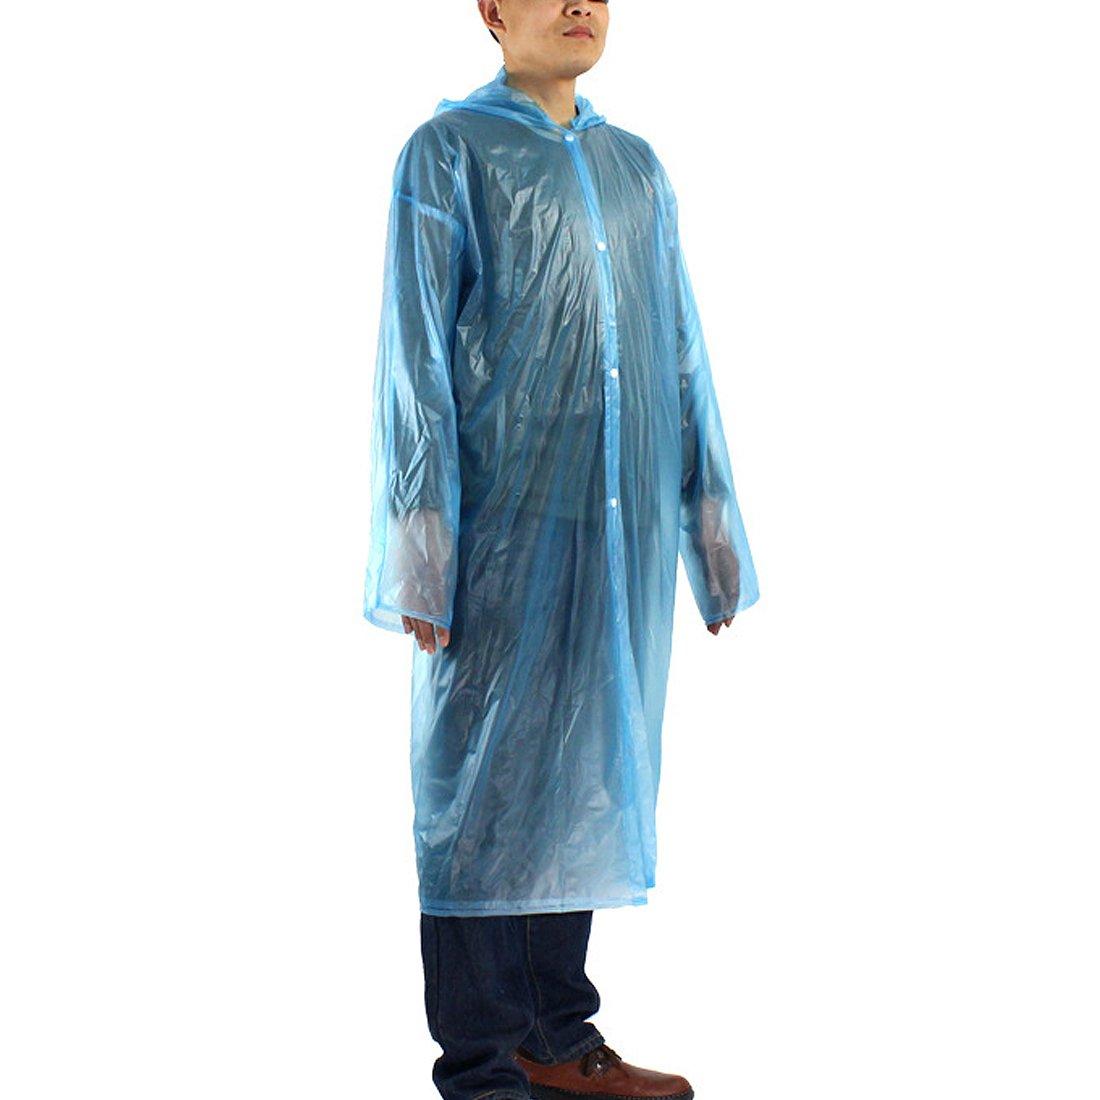 Sourcingmap–® Uno Tamaño Adulto desechables regla PVC con capucha Poncho chubasquero lluvia para al ...